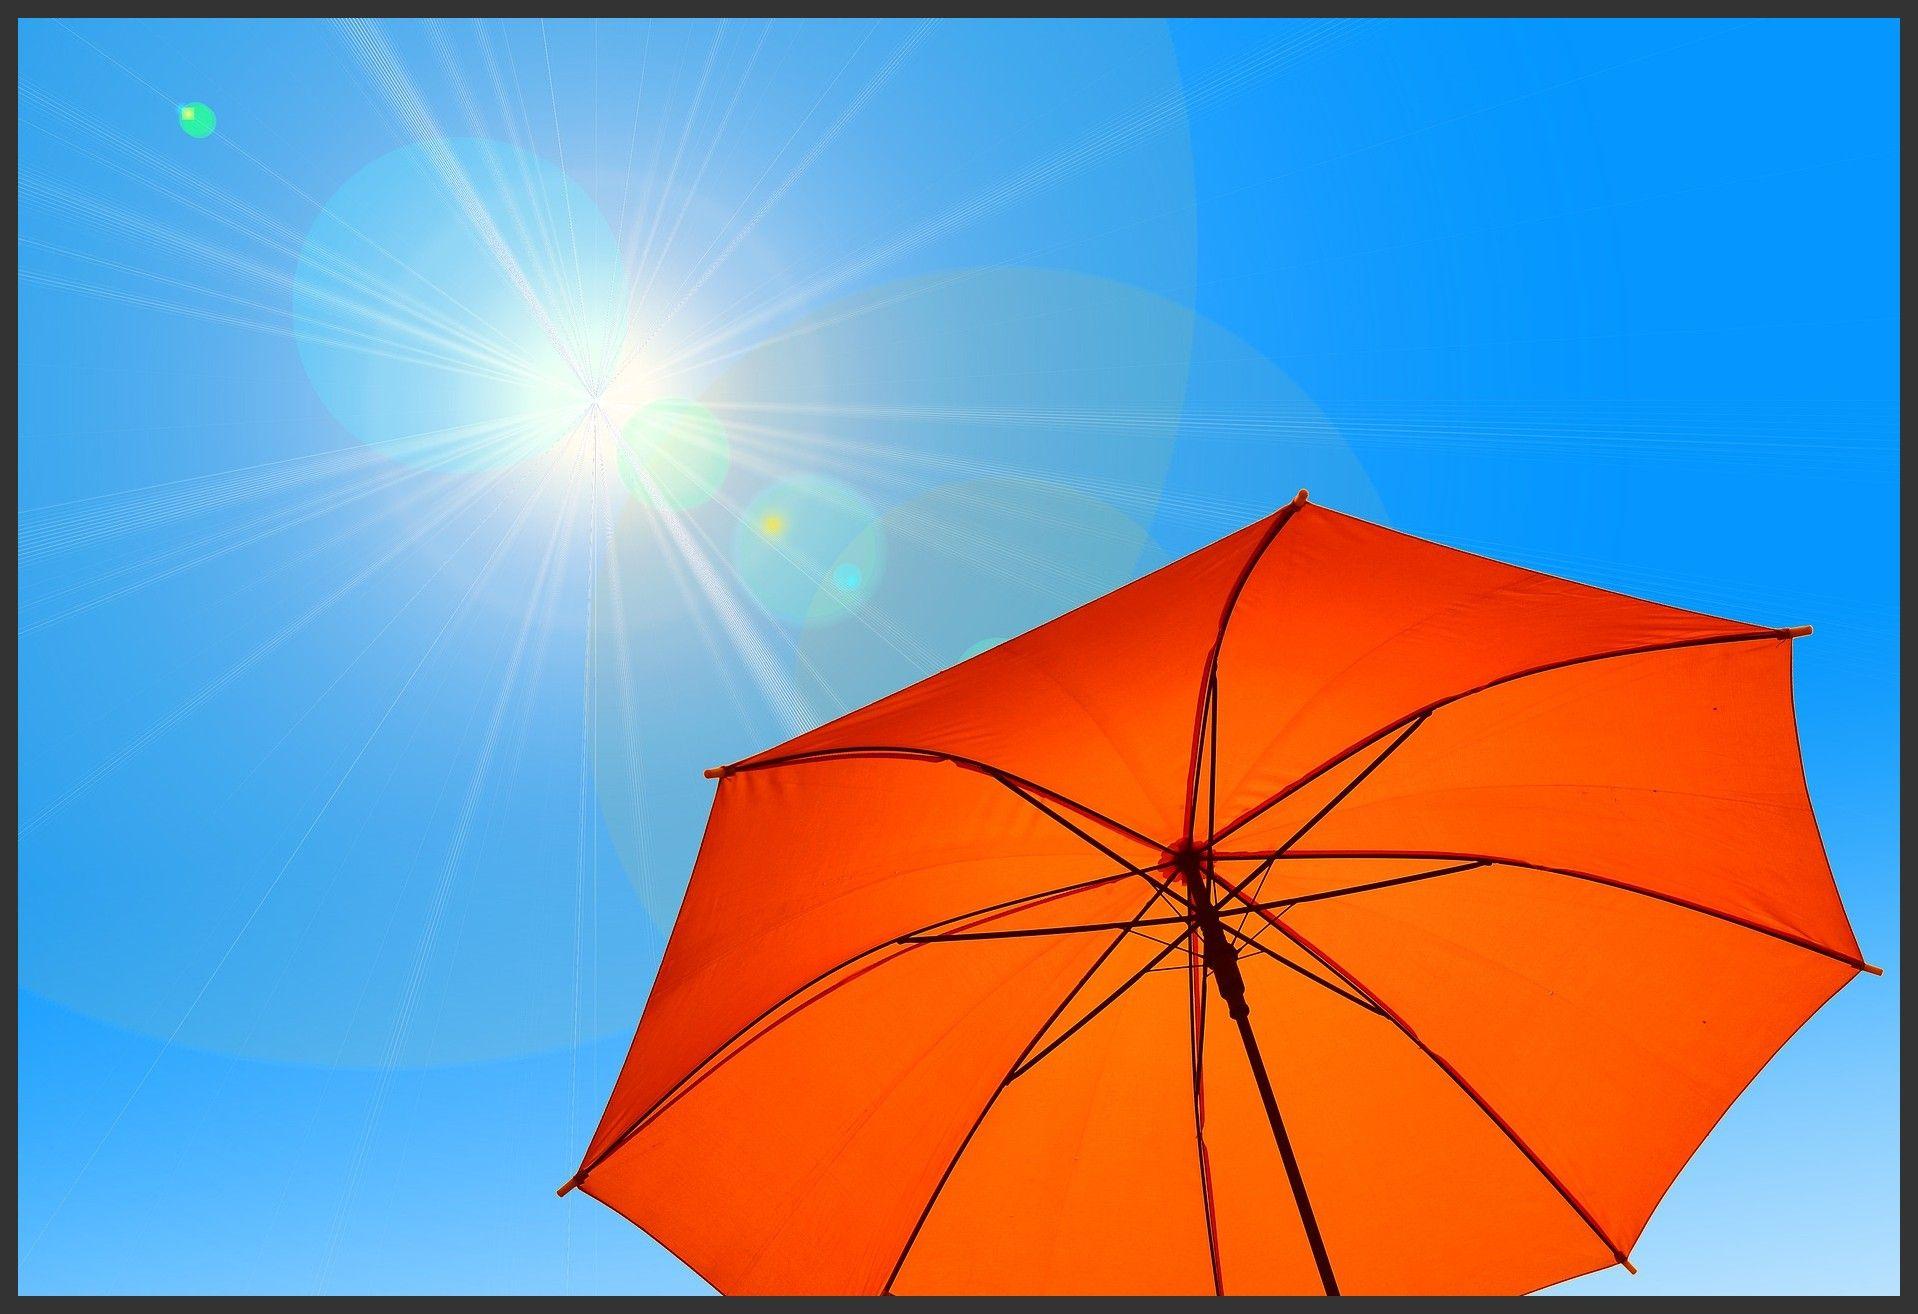 Parasol Umbrella Sun Sonnenschirm Sonnenschirm Fitness And